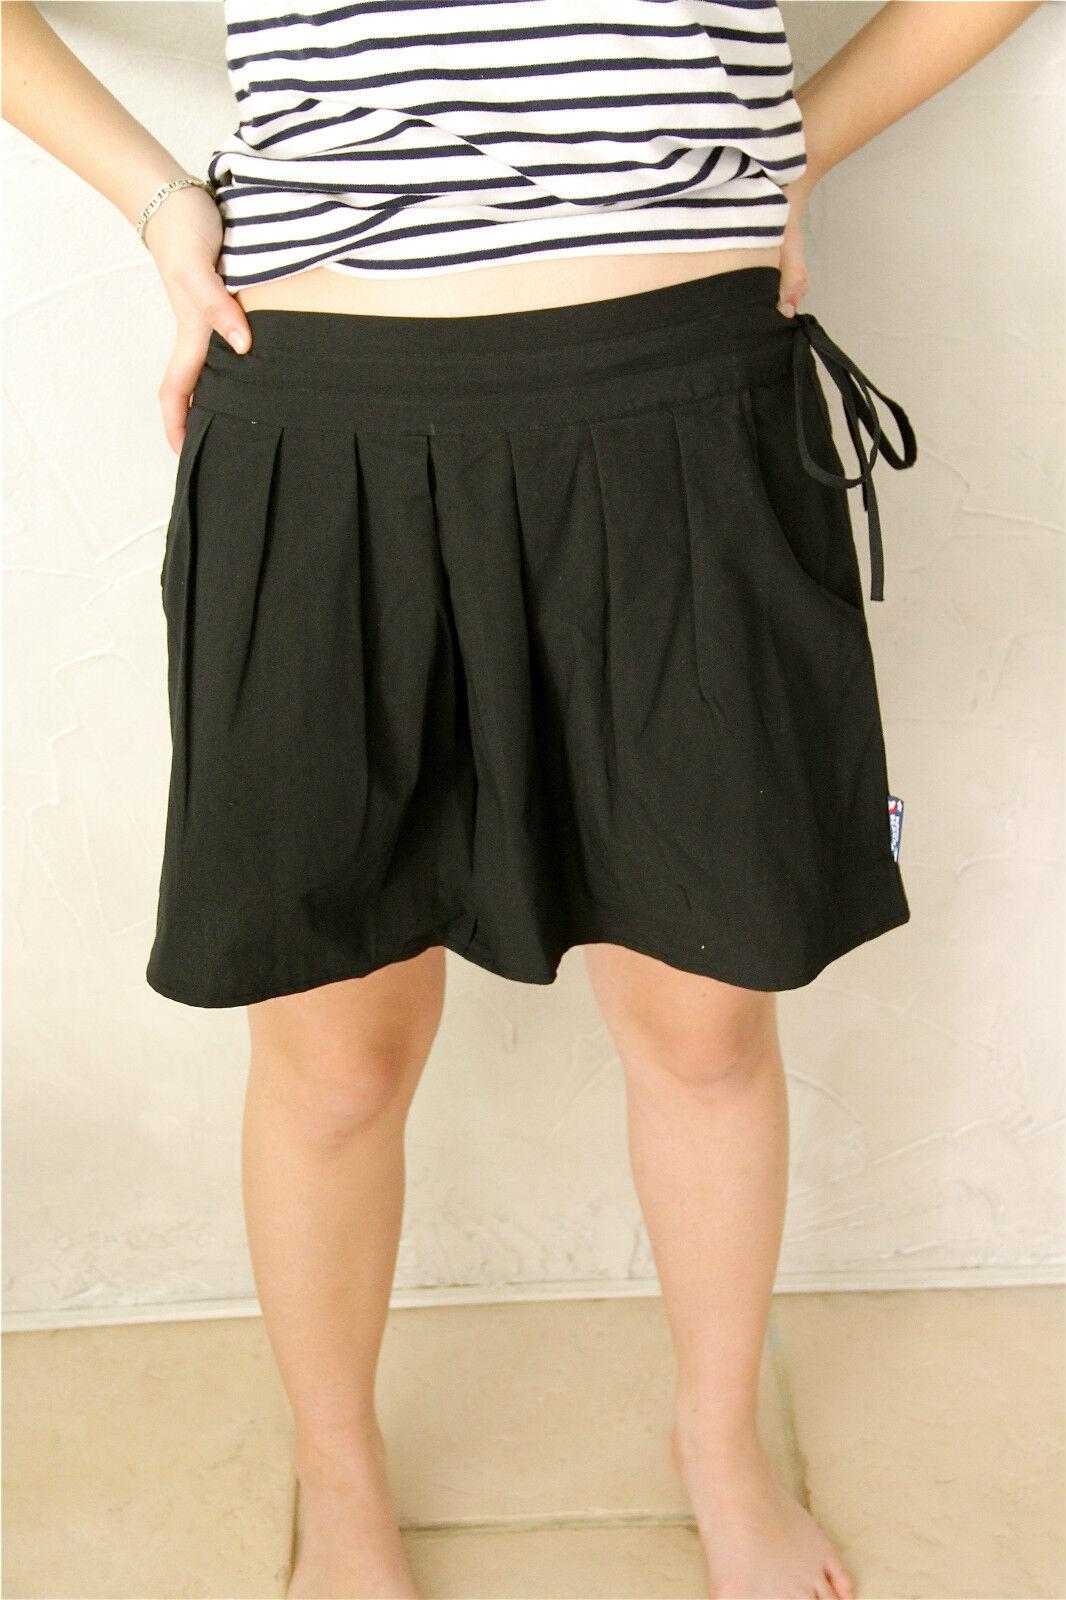 Mini jupe blacke KANABEACH metropark size 38  NEUF ÉTIQUETTE valeur